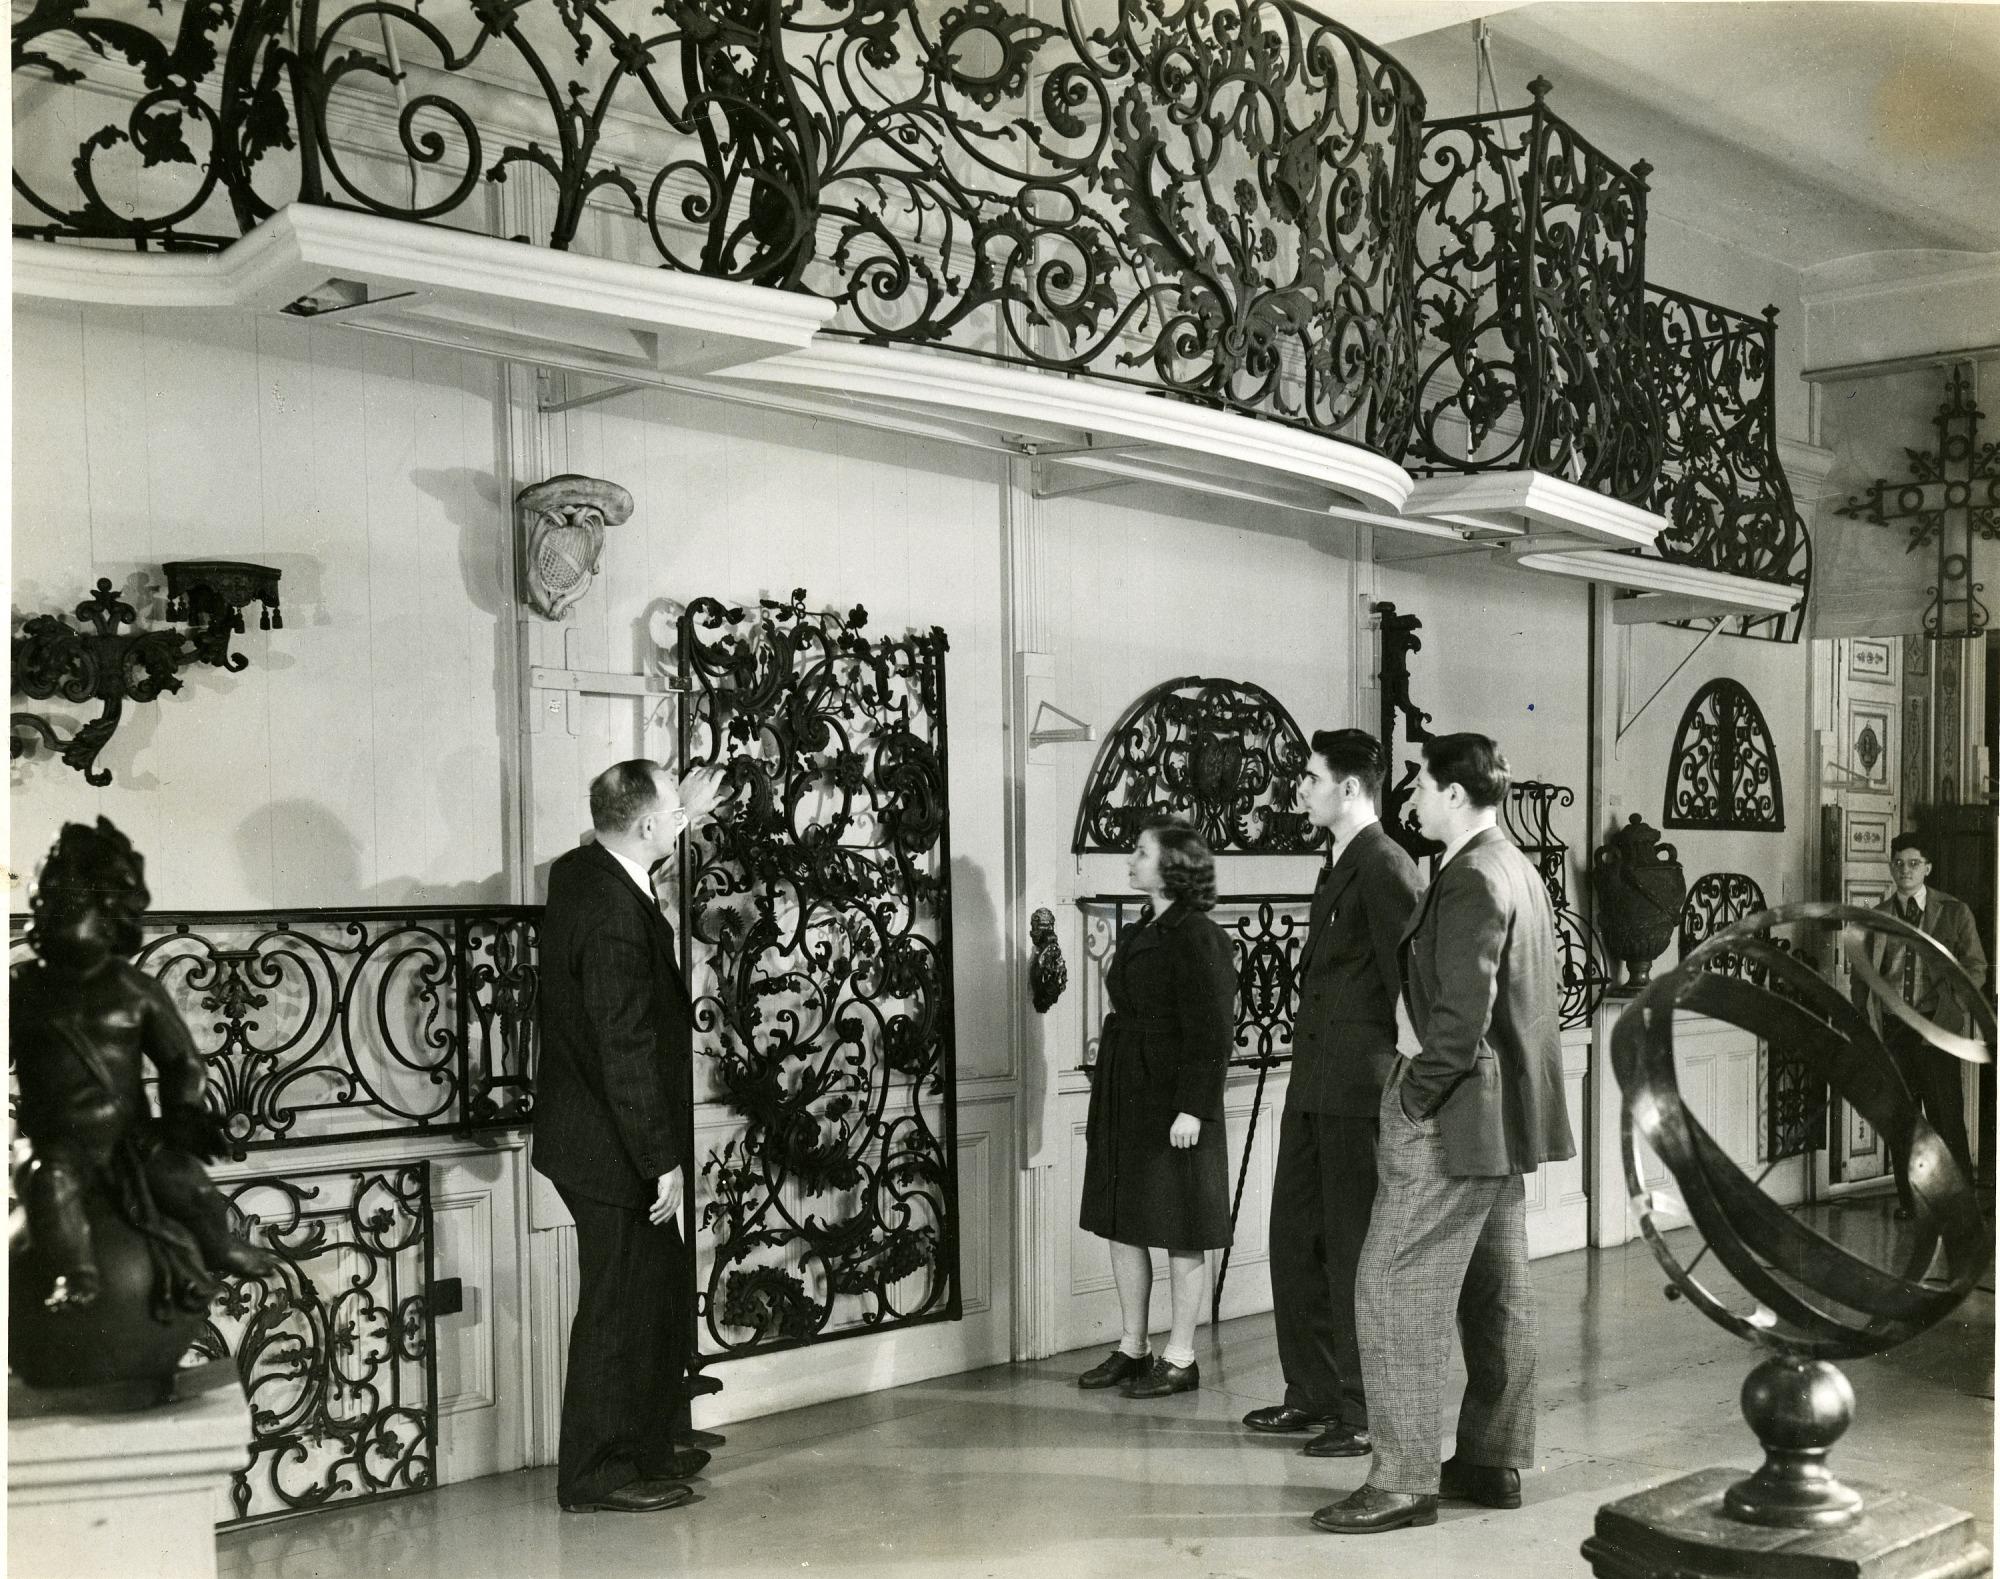 Cooper Union Museum's Metalwork Gallery